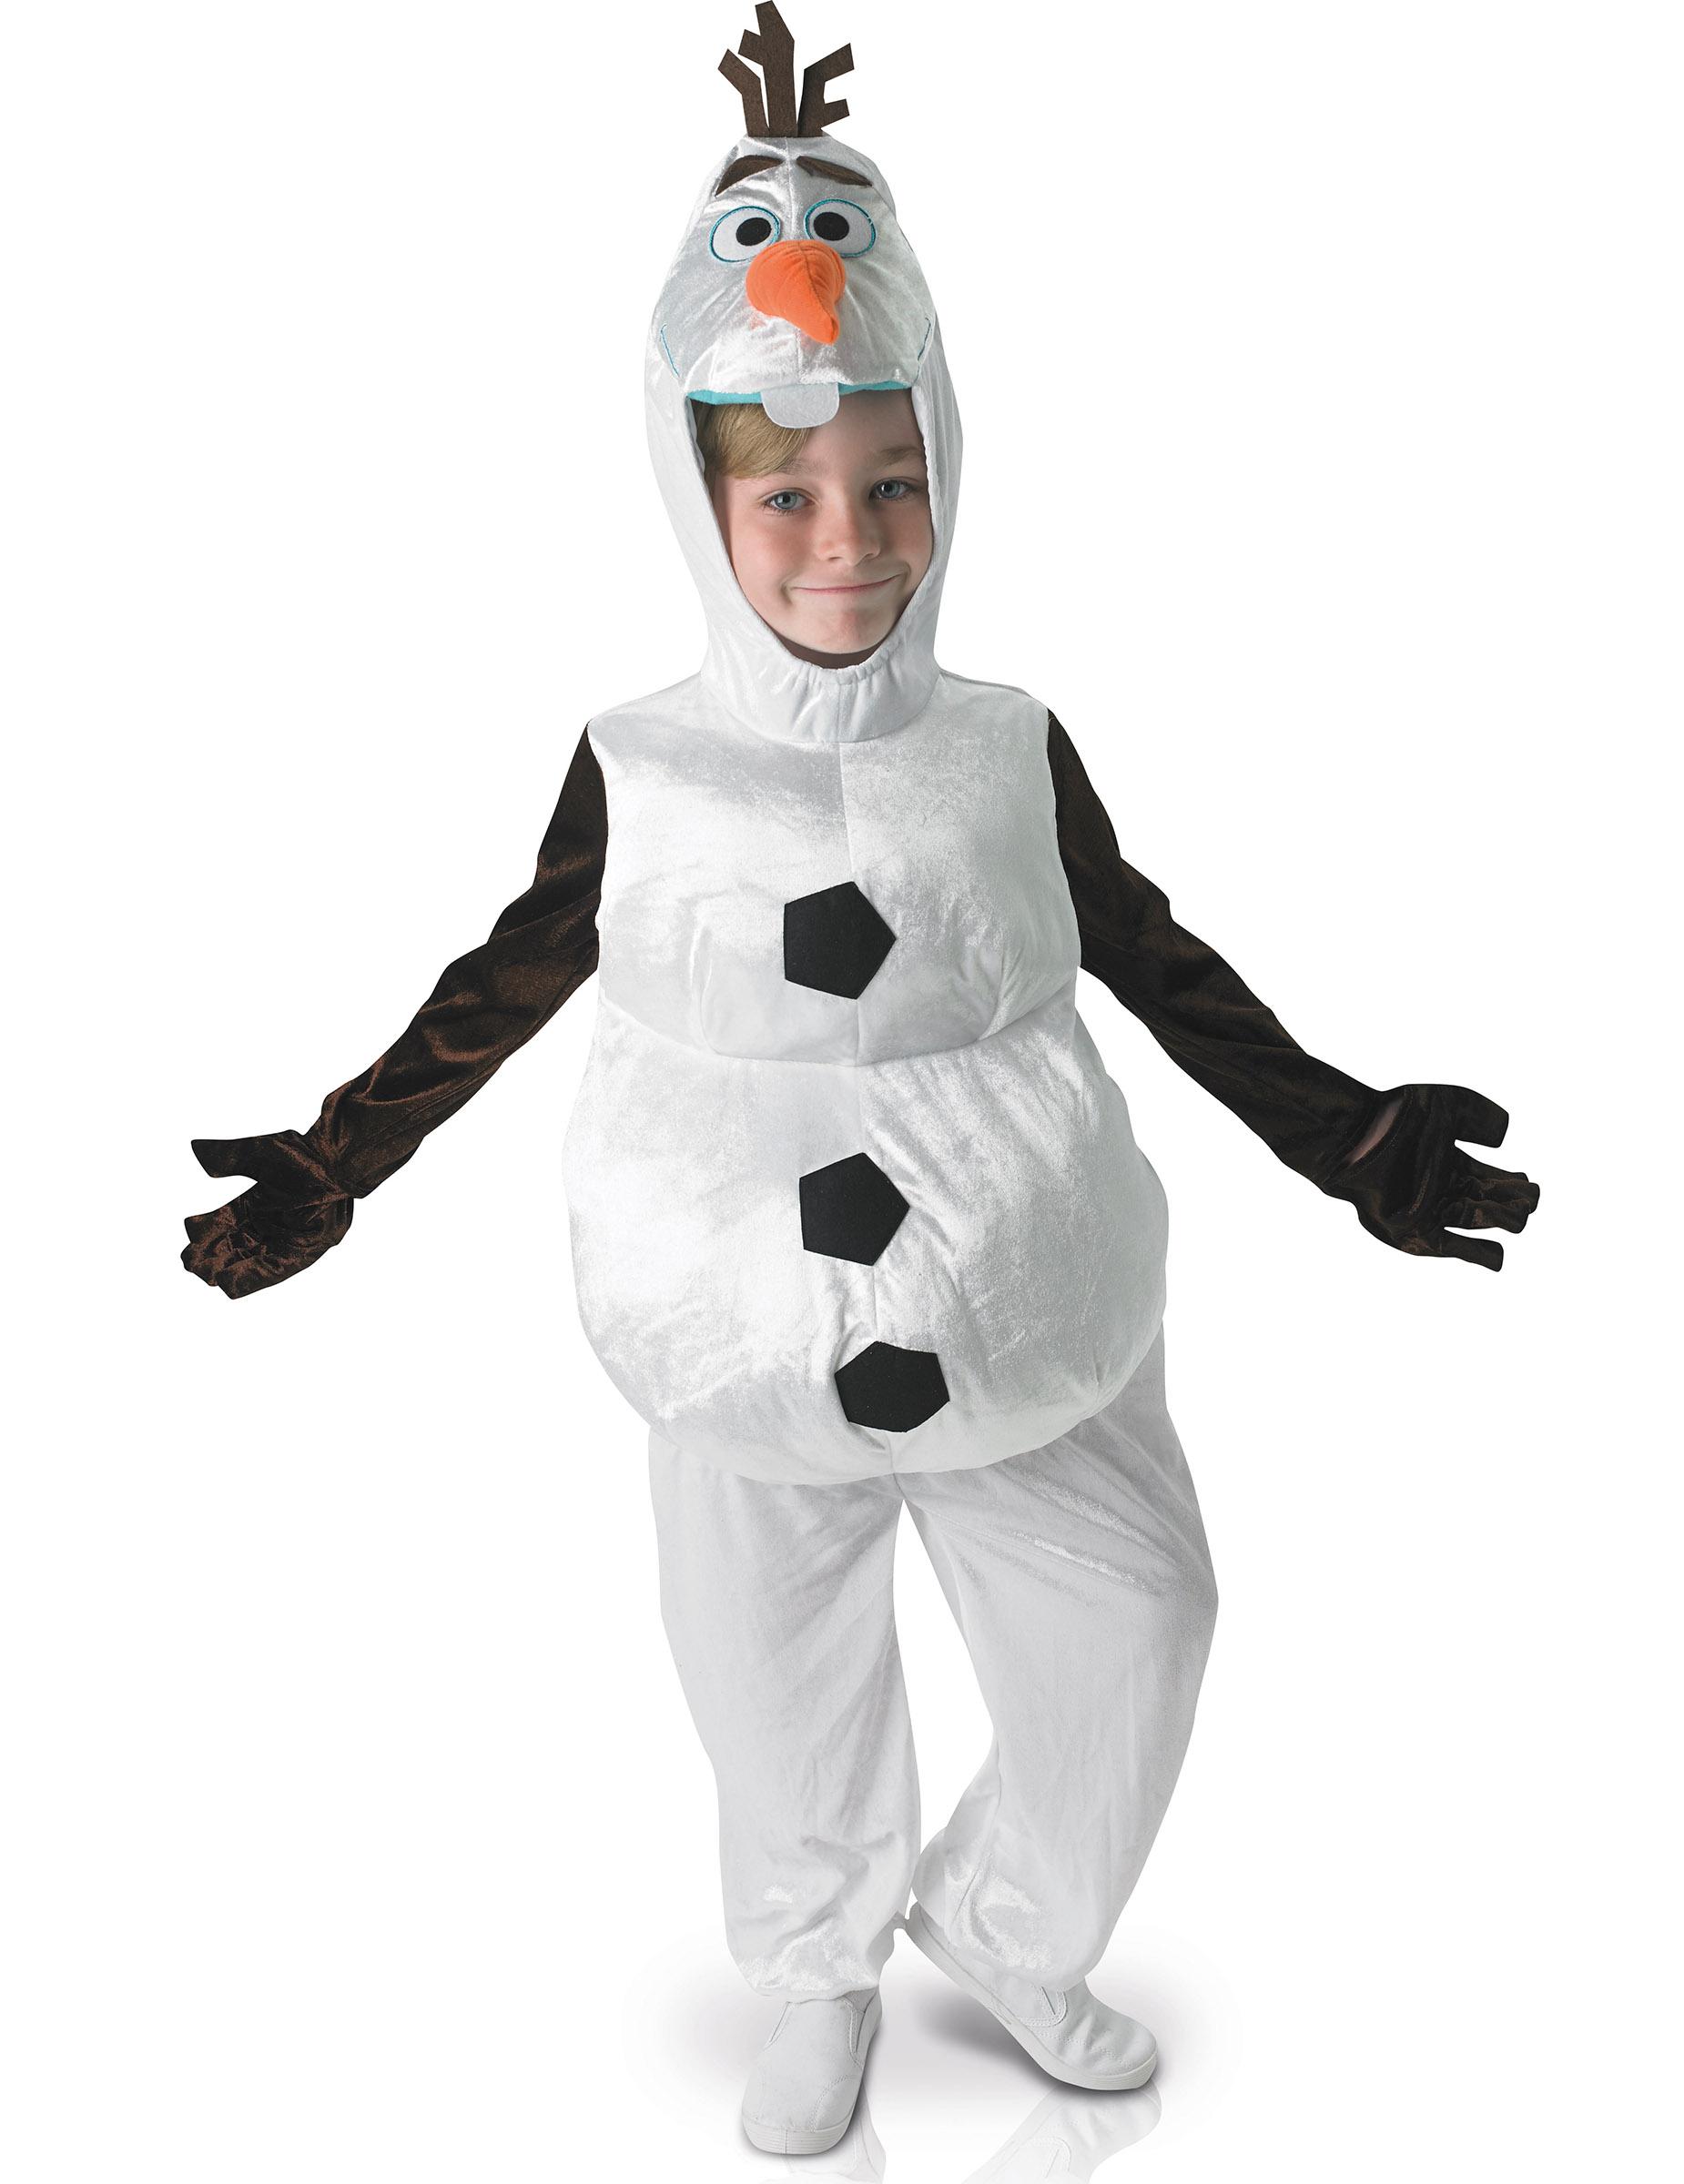 Carnaval Kostuum Kind.Luxe Gevoerde Olaf Kostuum Voor Kinderen